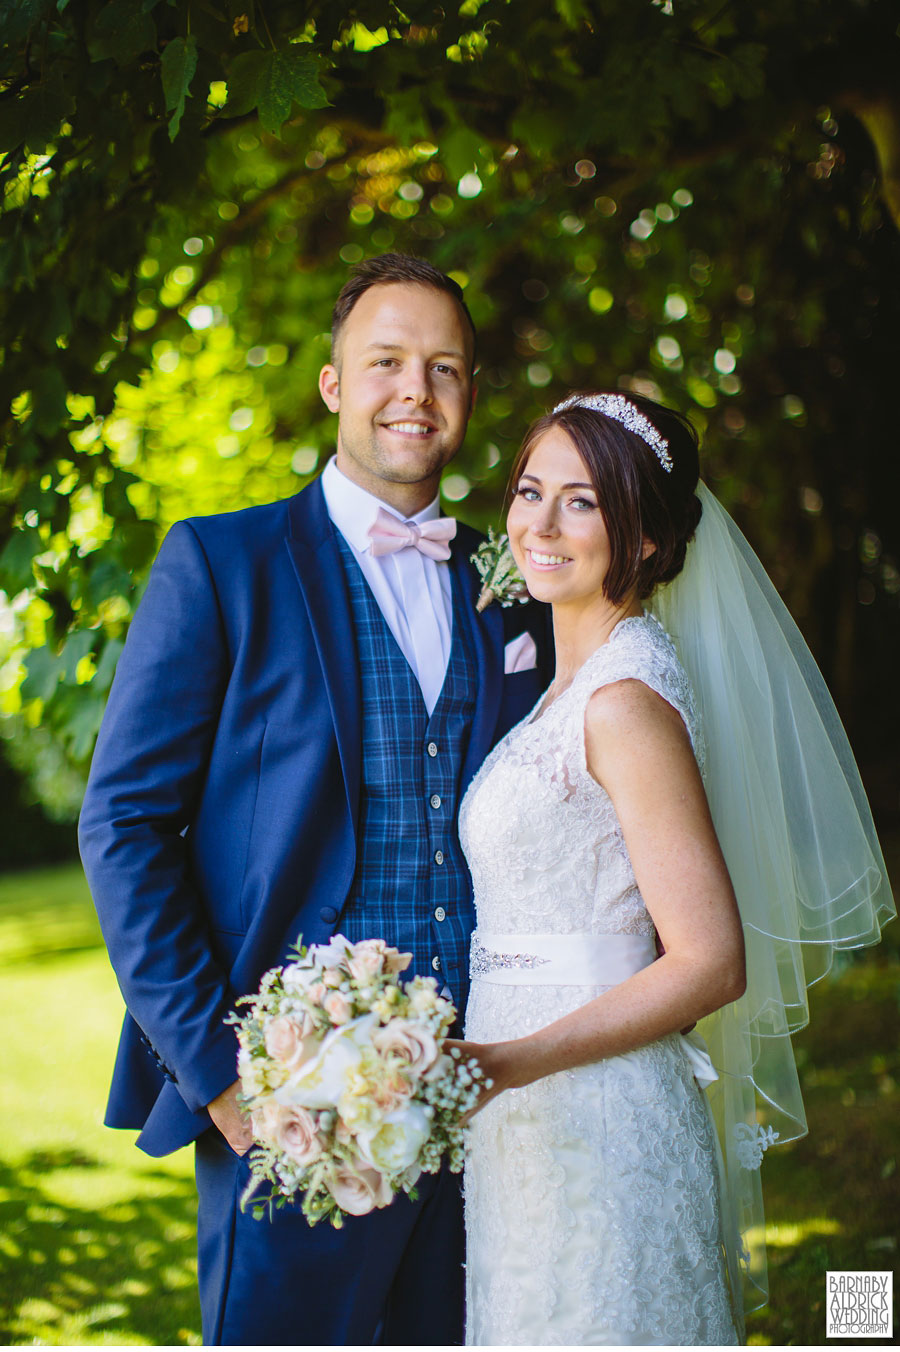 Wood Hall Linton Wetherby Wedding Photography 048